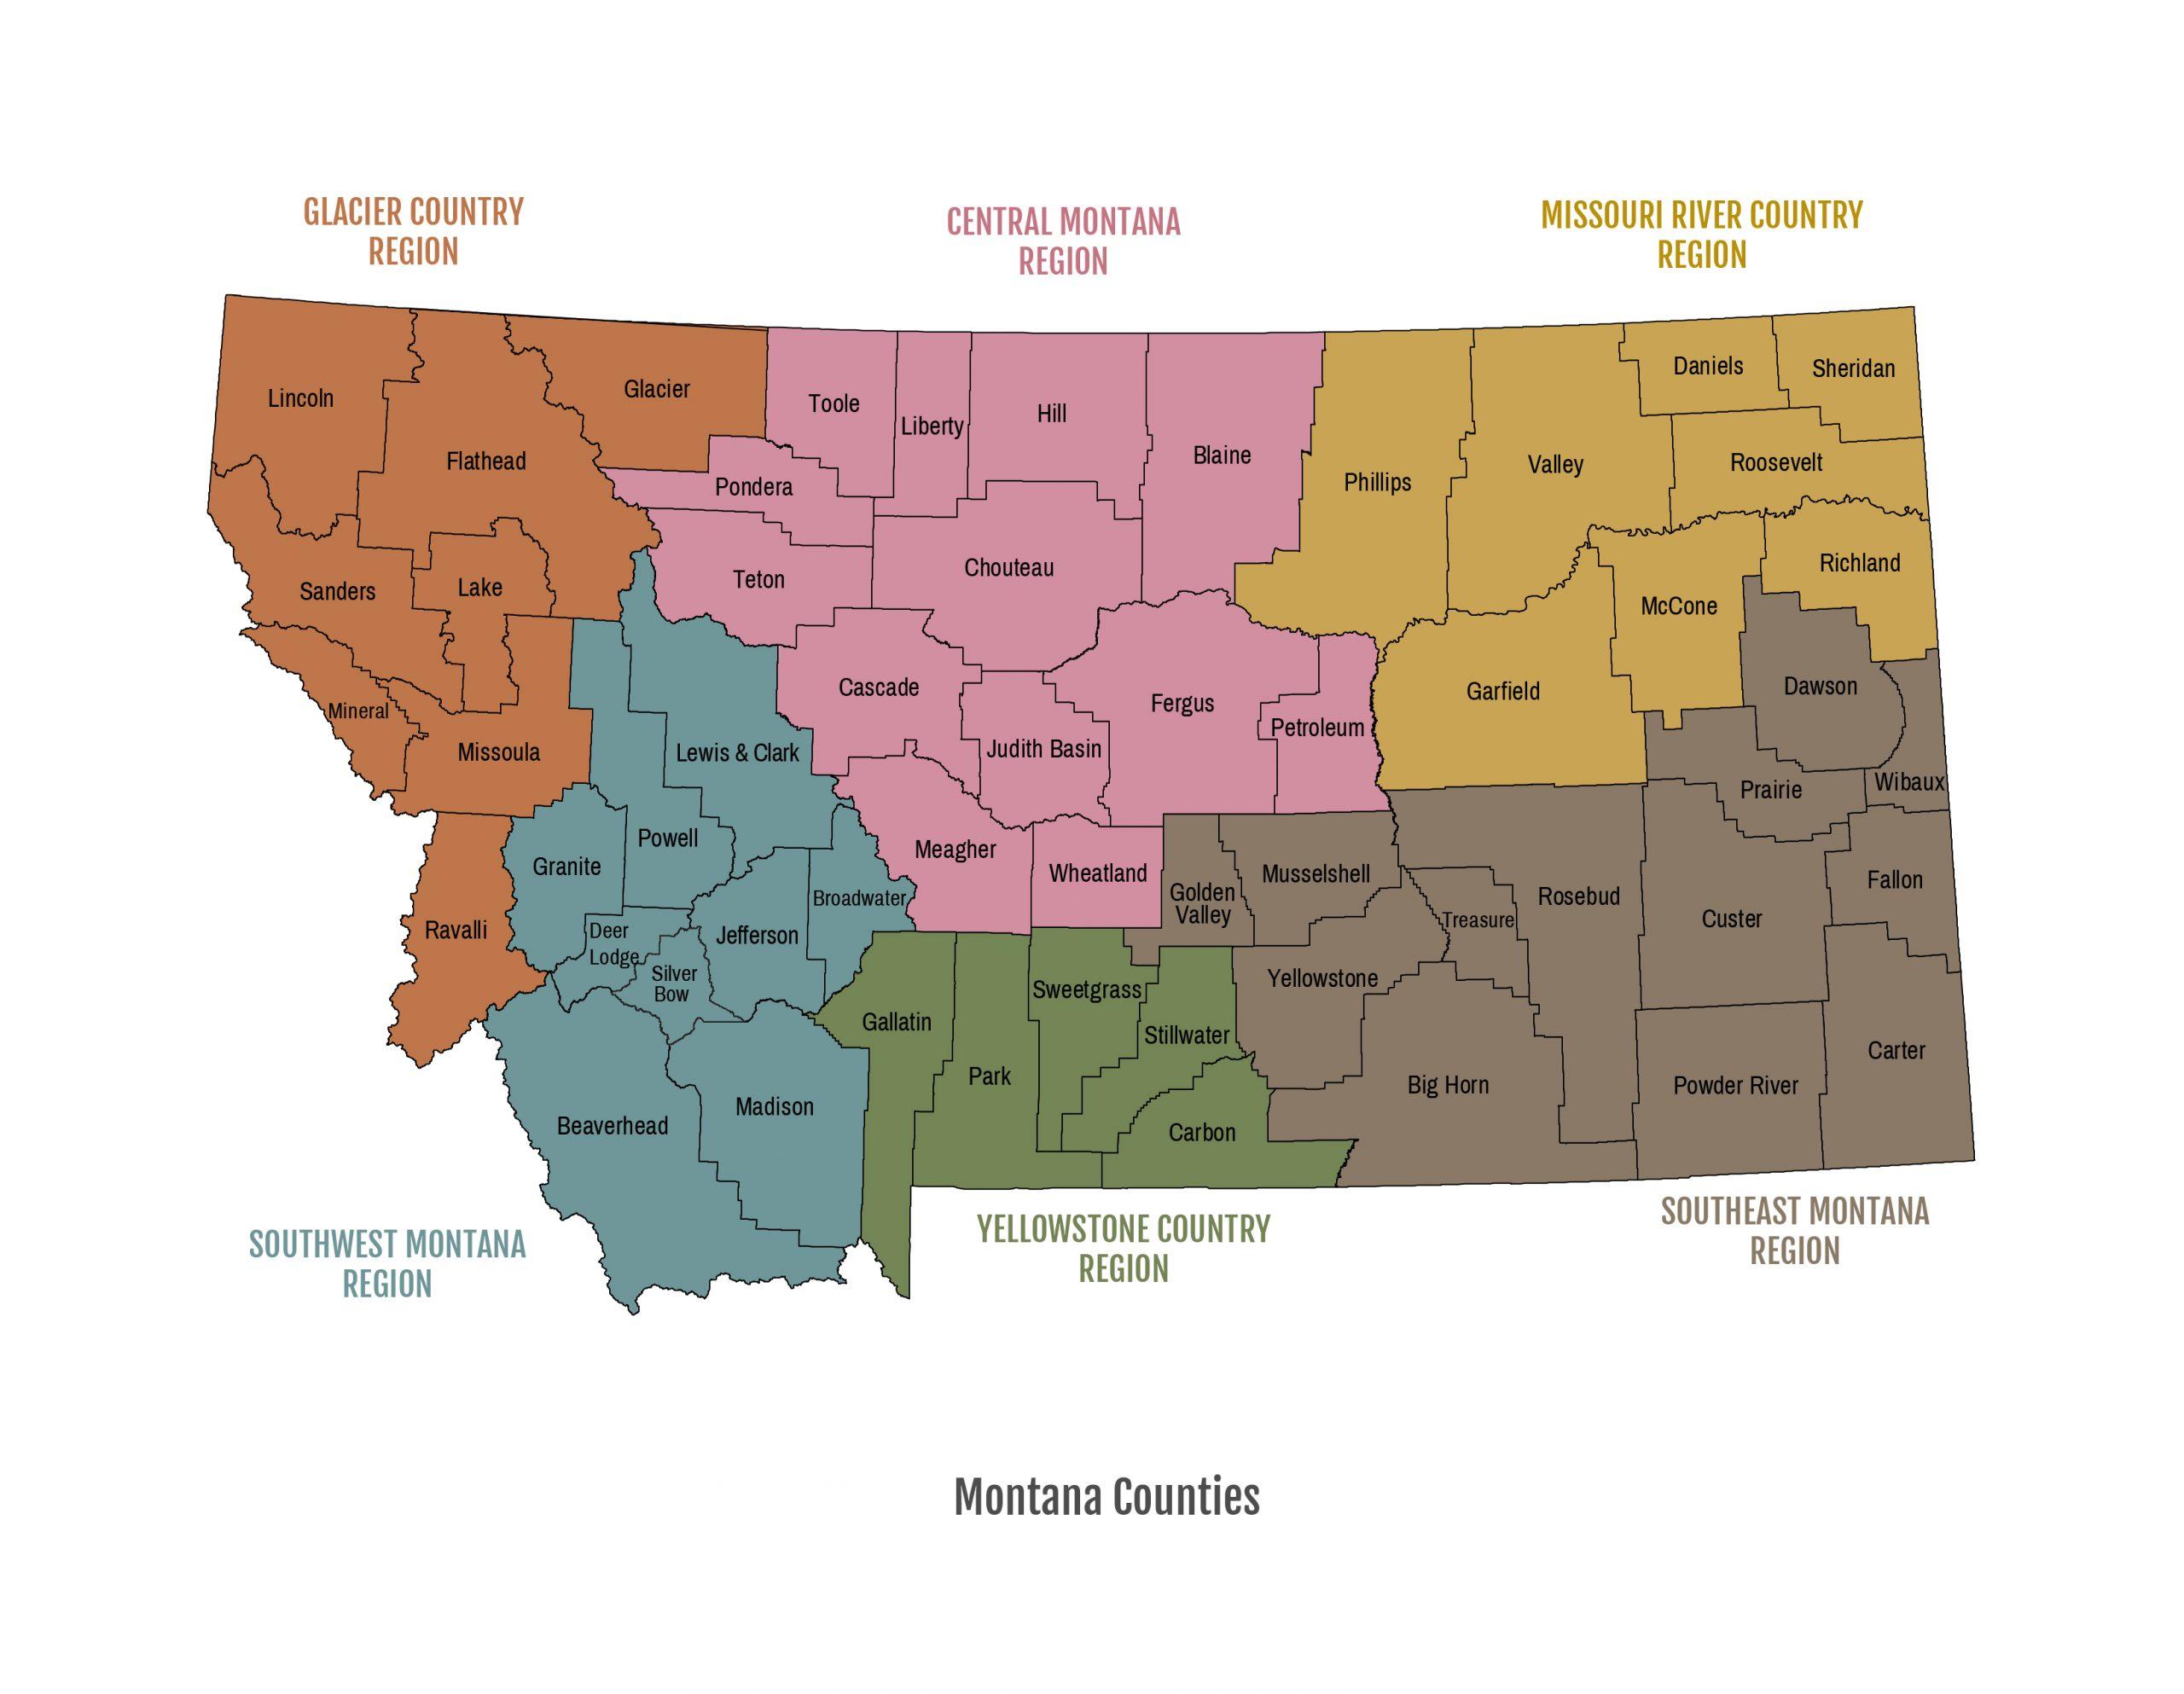 County Regions